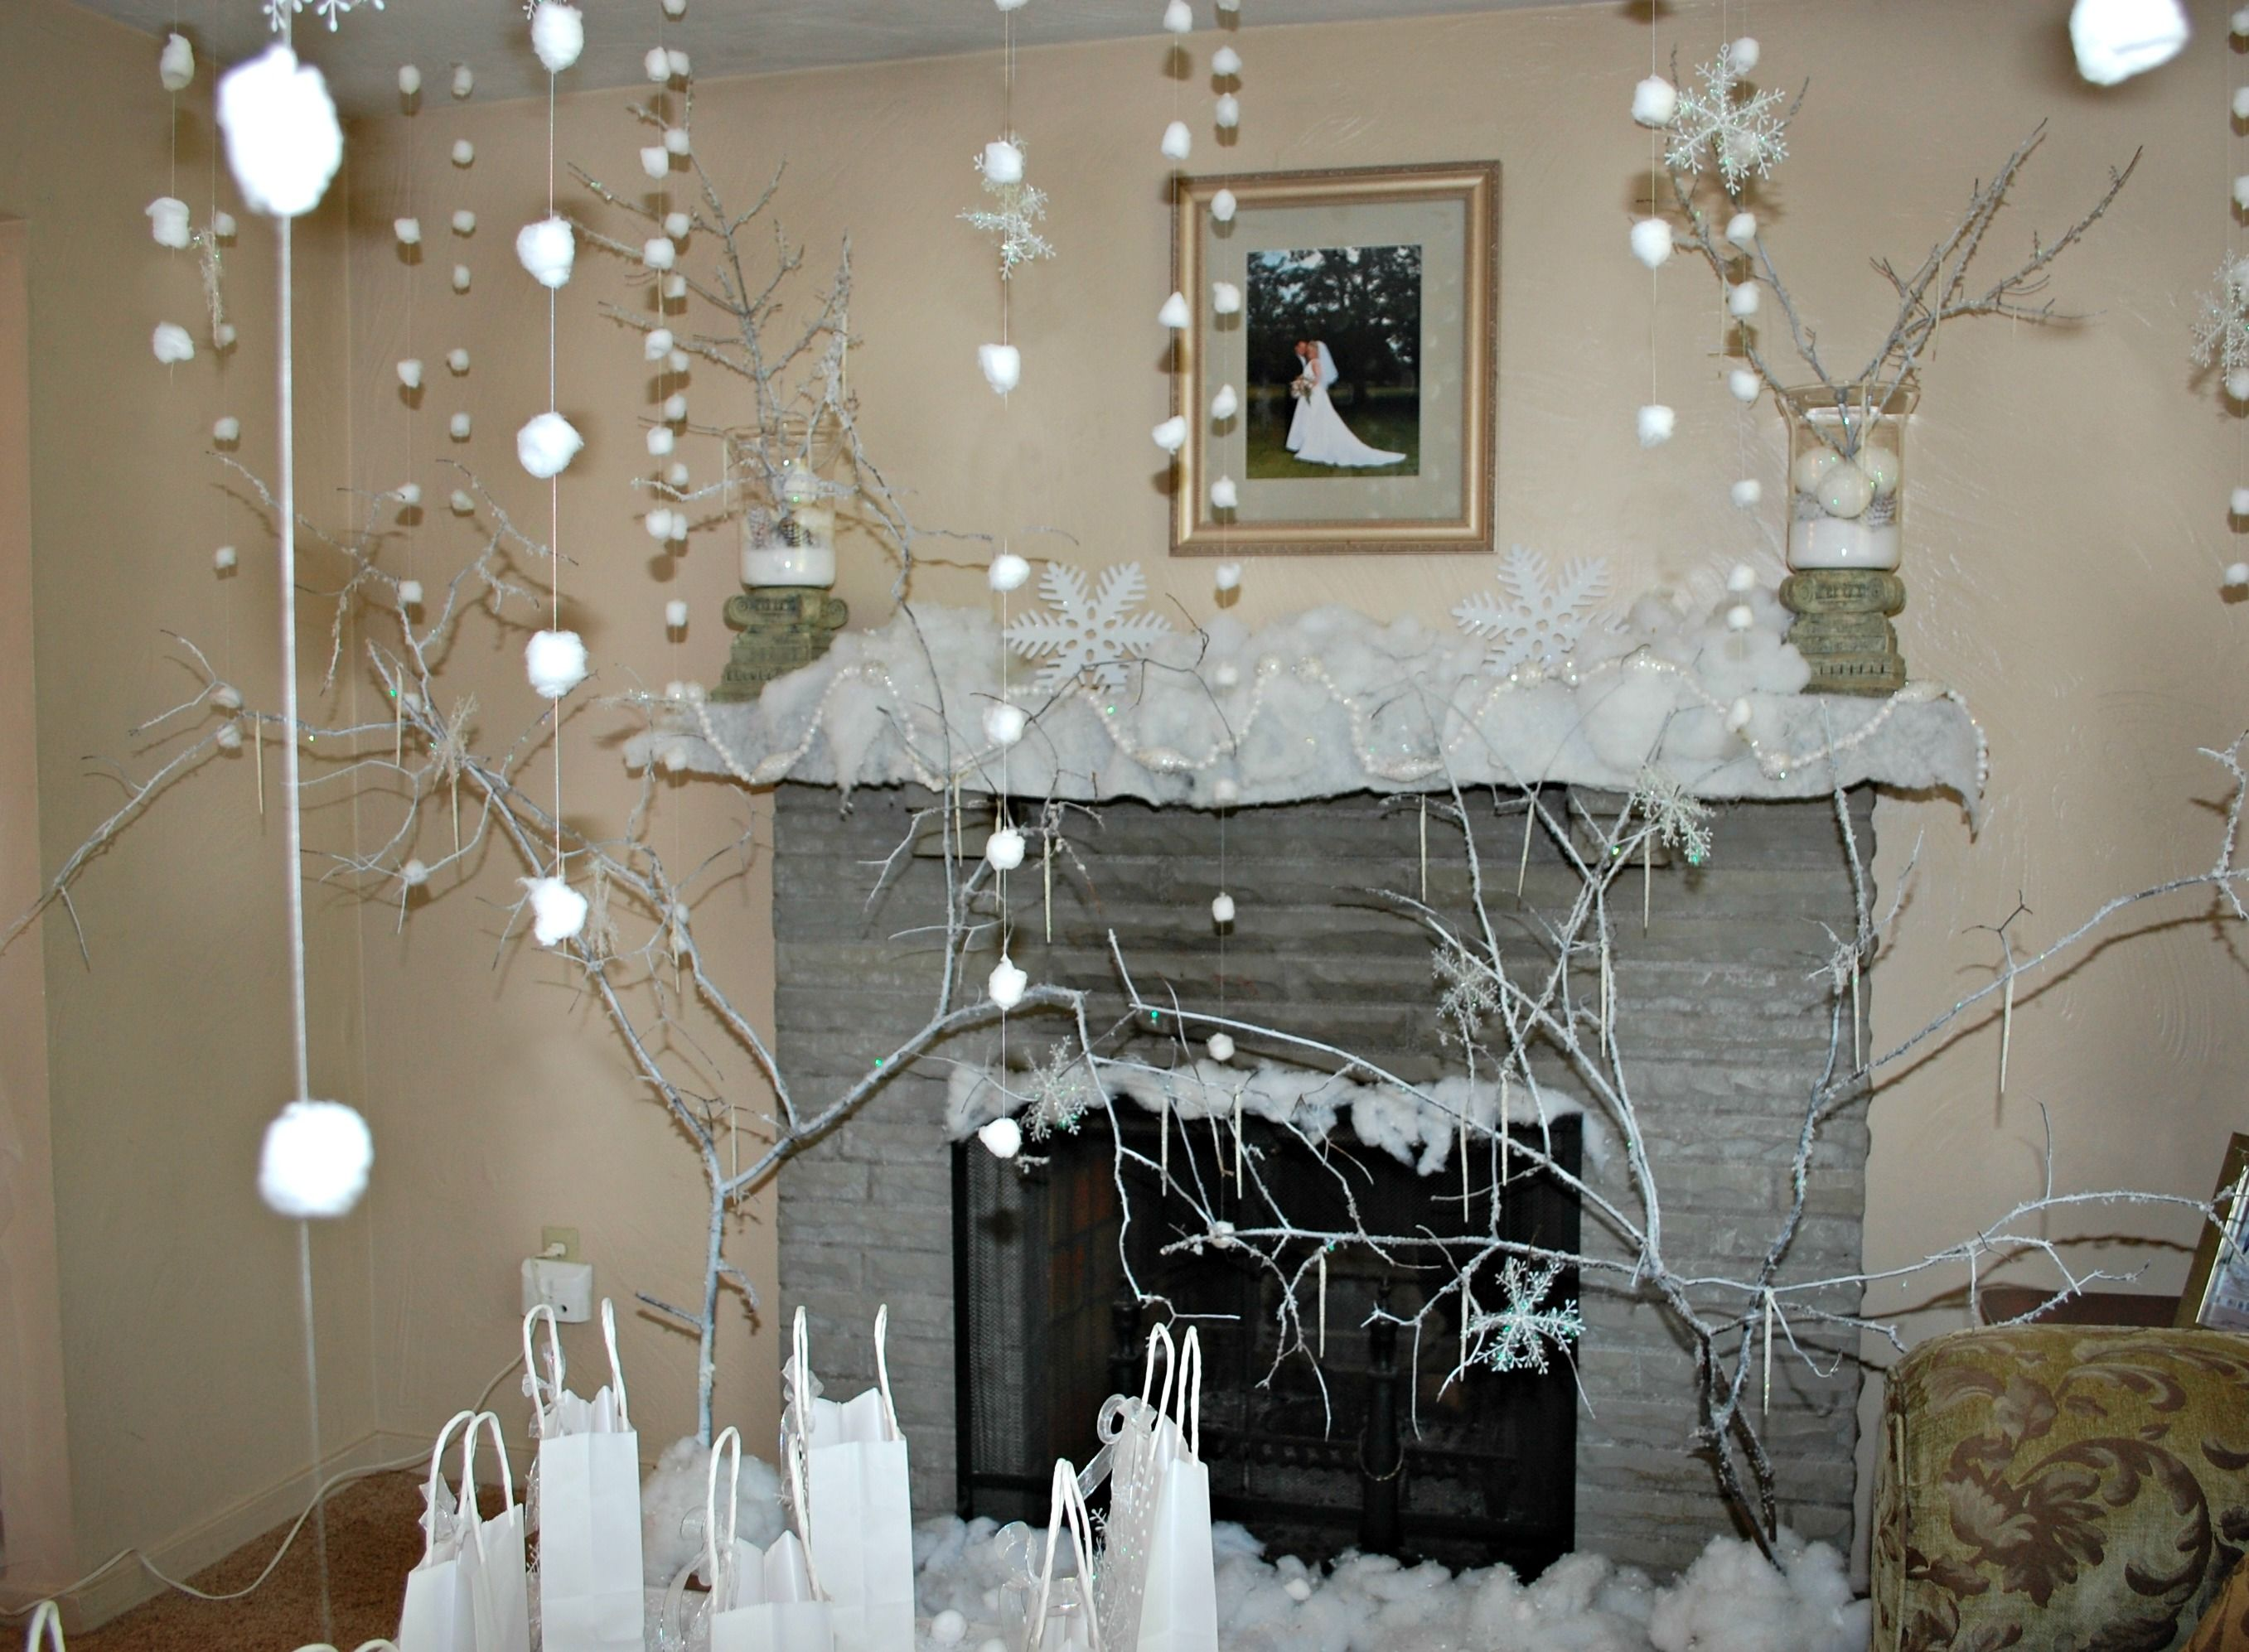 Cotton ball snow falling from the ceiling winter wonderland birthday party pinterest snow - Cotton ballspractical ideas ...